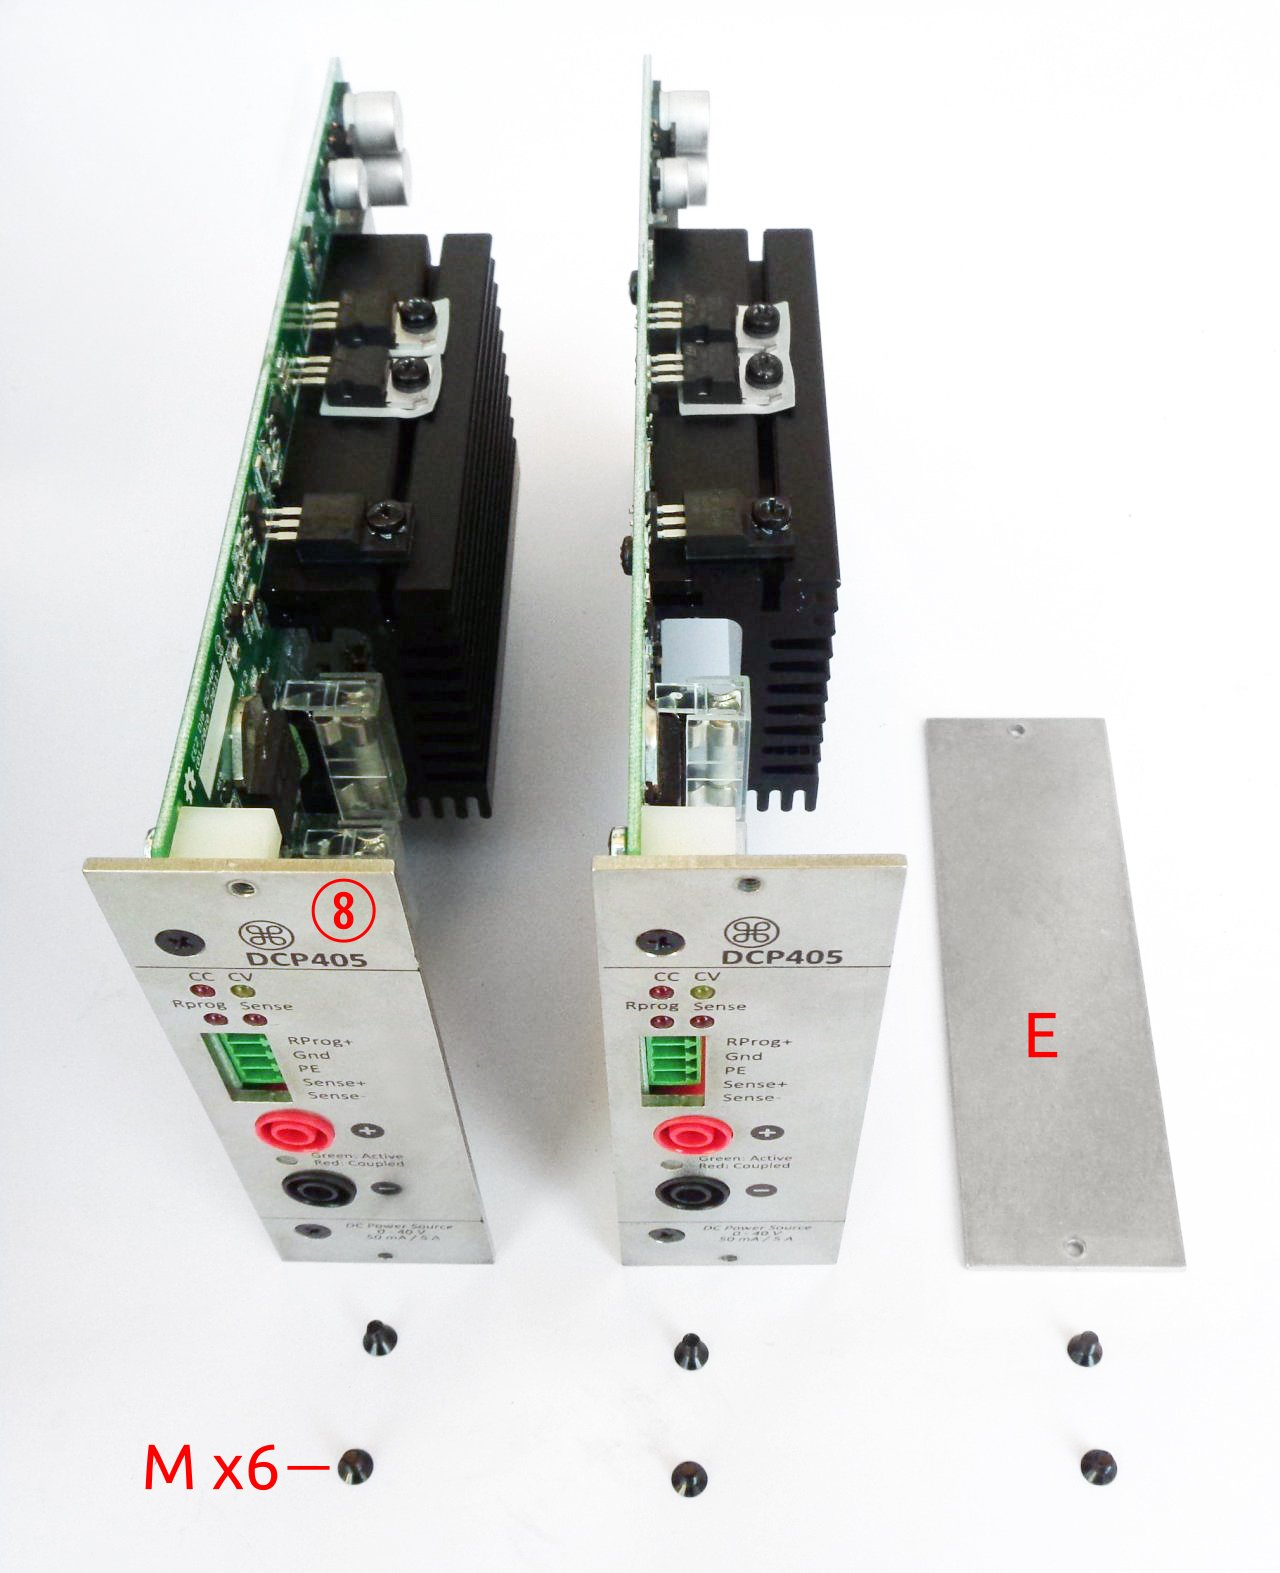 bb3_instr_power_modules_parts.jpg